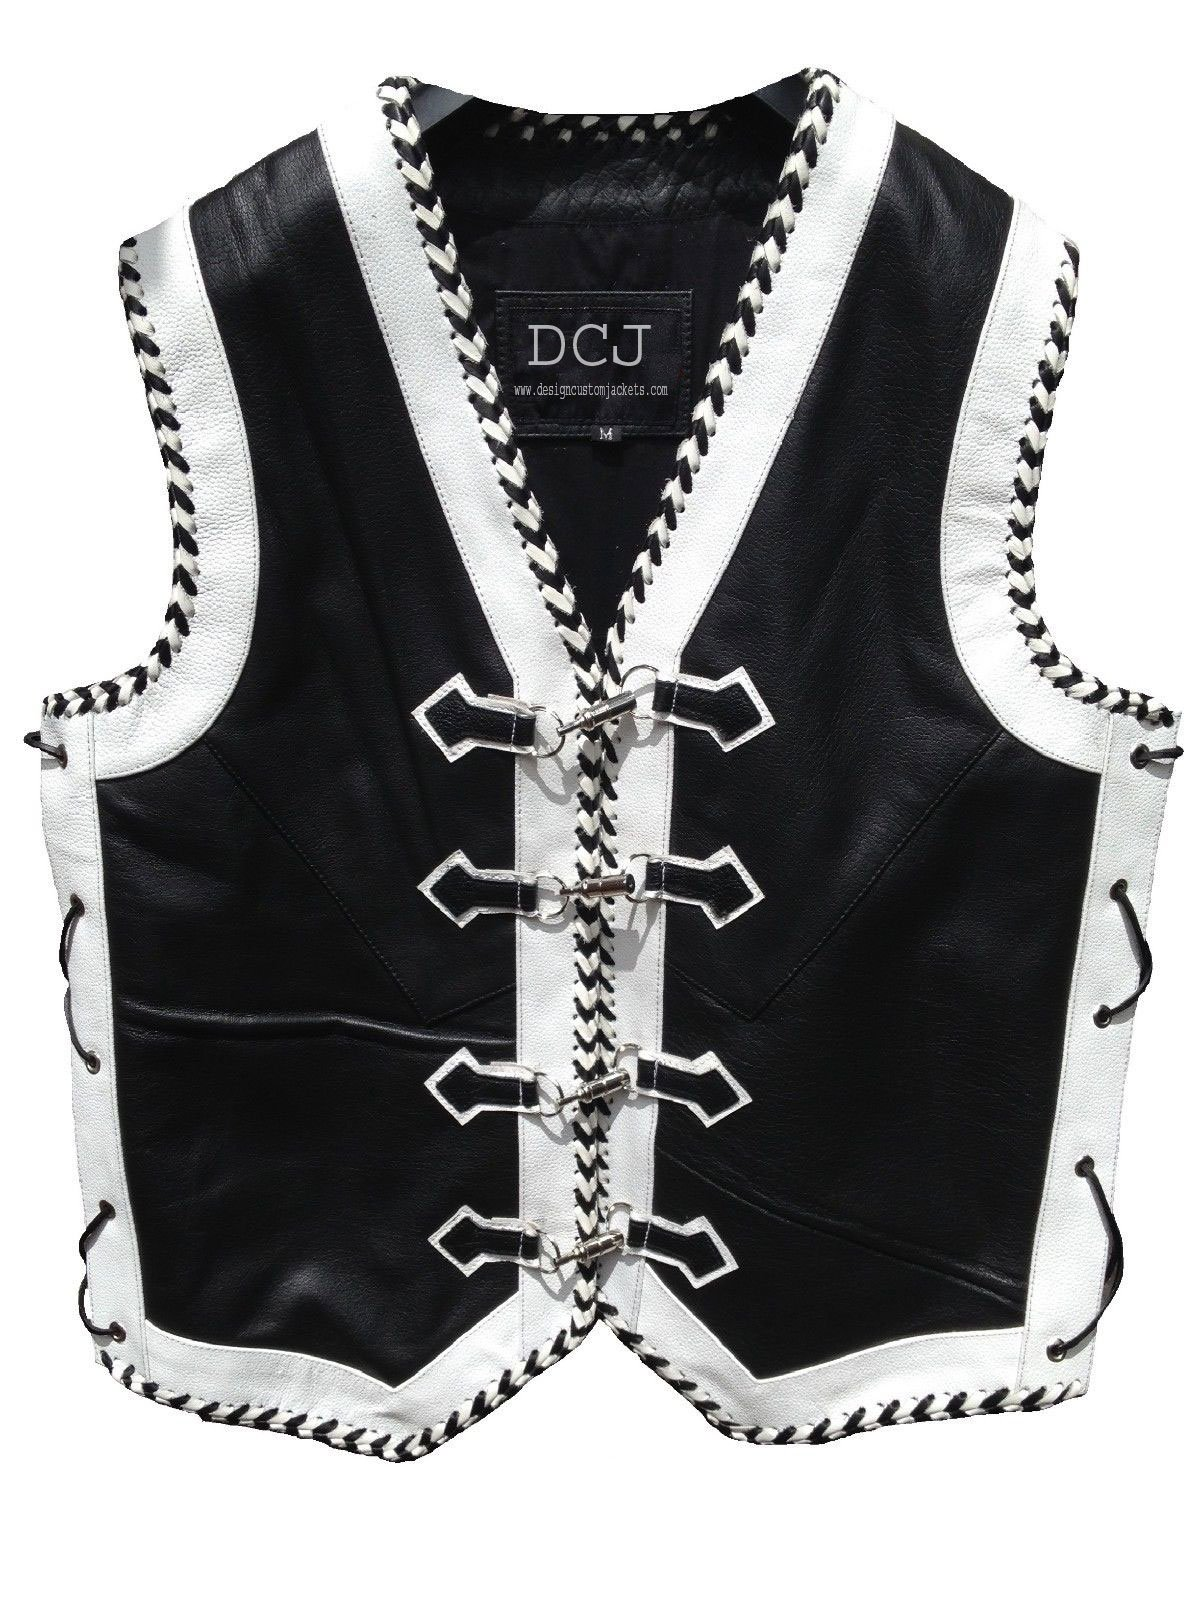 Leather Motorcycle Vest Custom Motorbike Biker Rider Waistcoat Hand Braided (XXL)